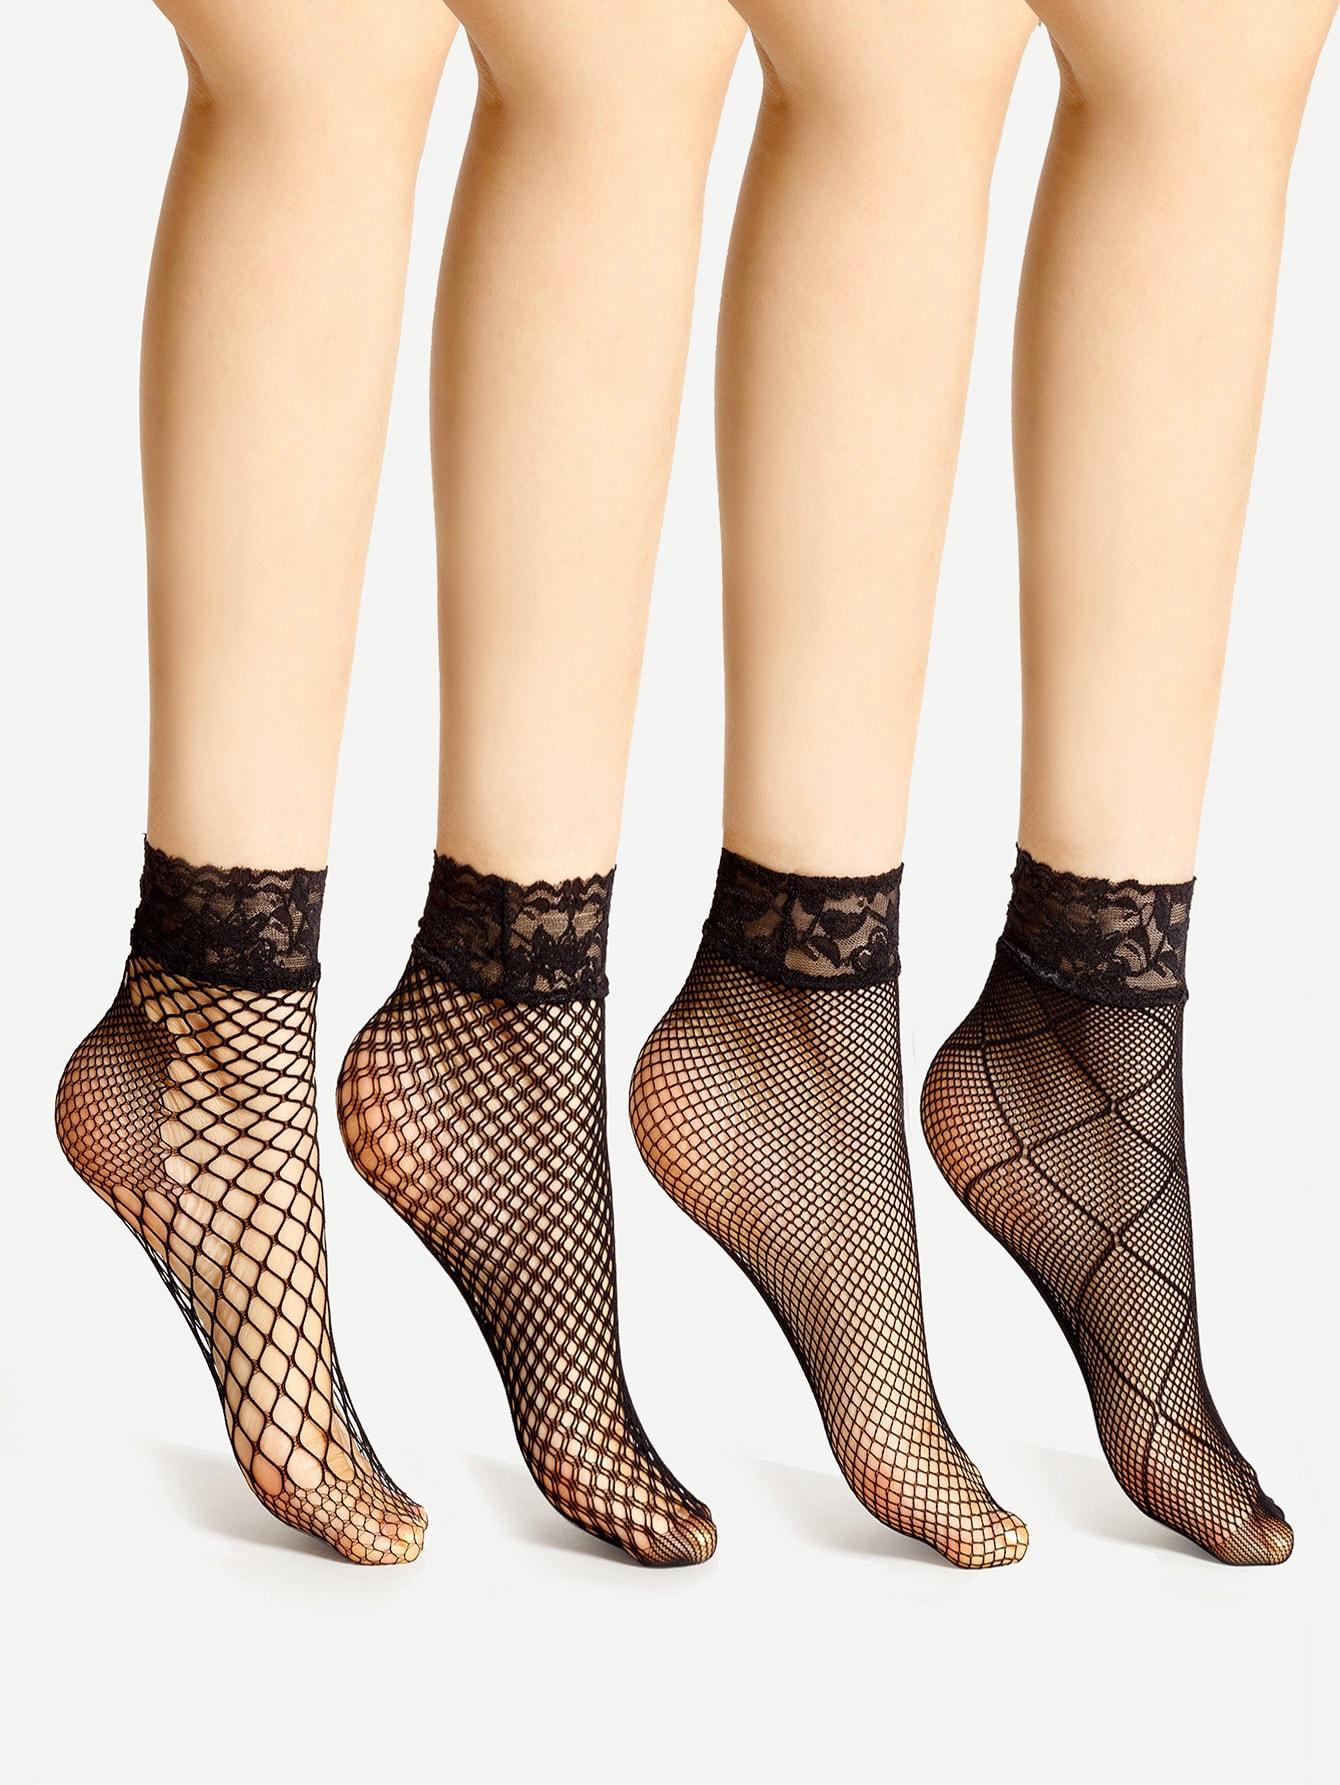 Lace Trim Fishnet Ankle Socks 4 Pairs fishnet ankle socks